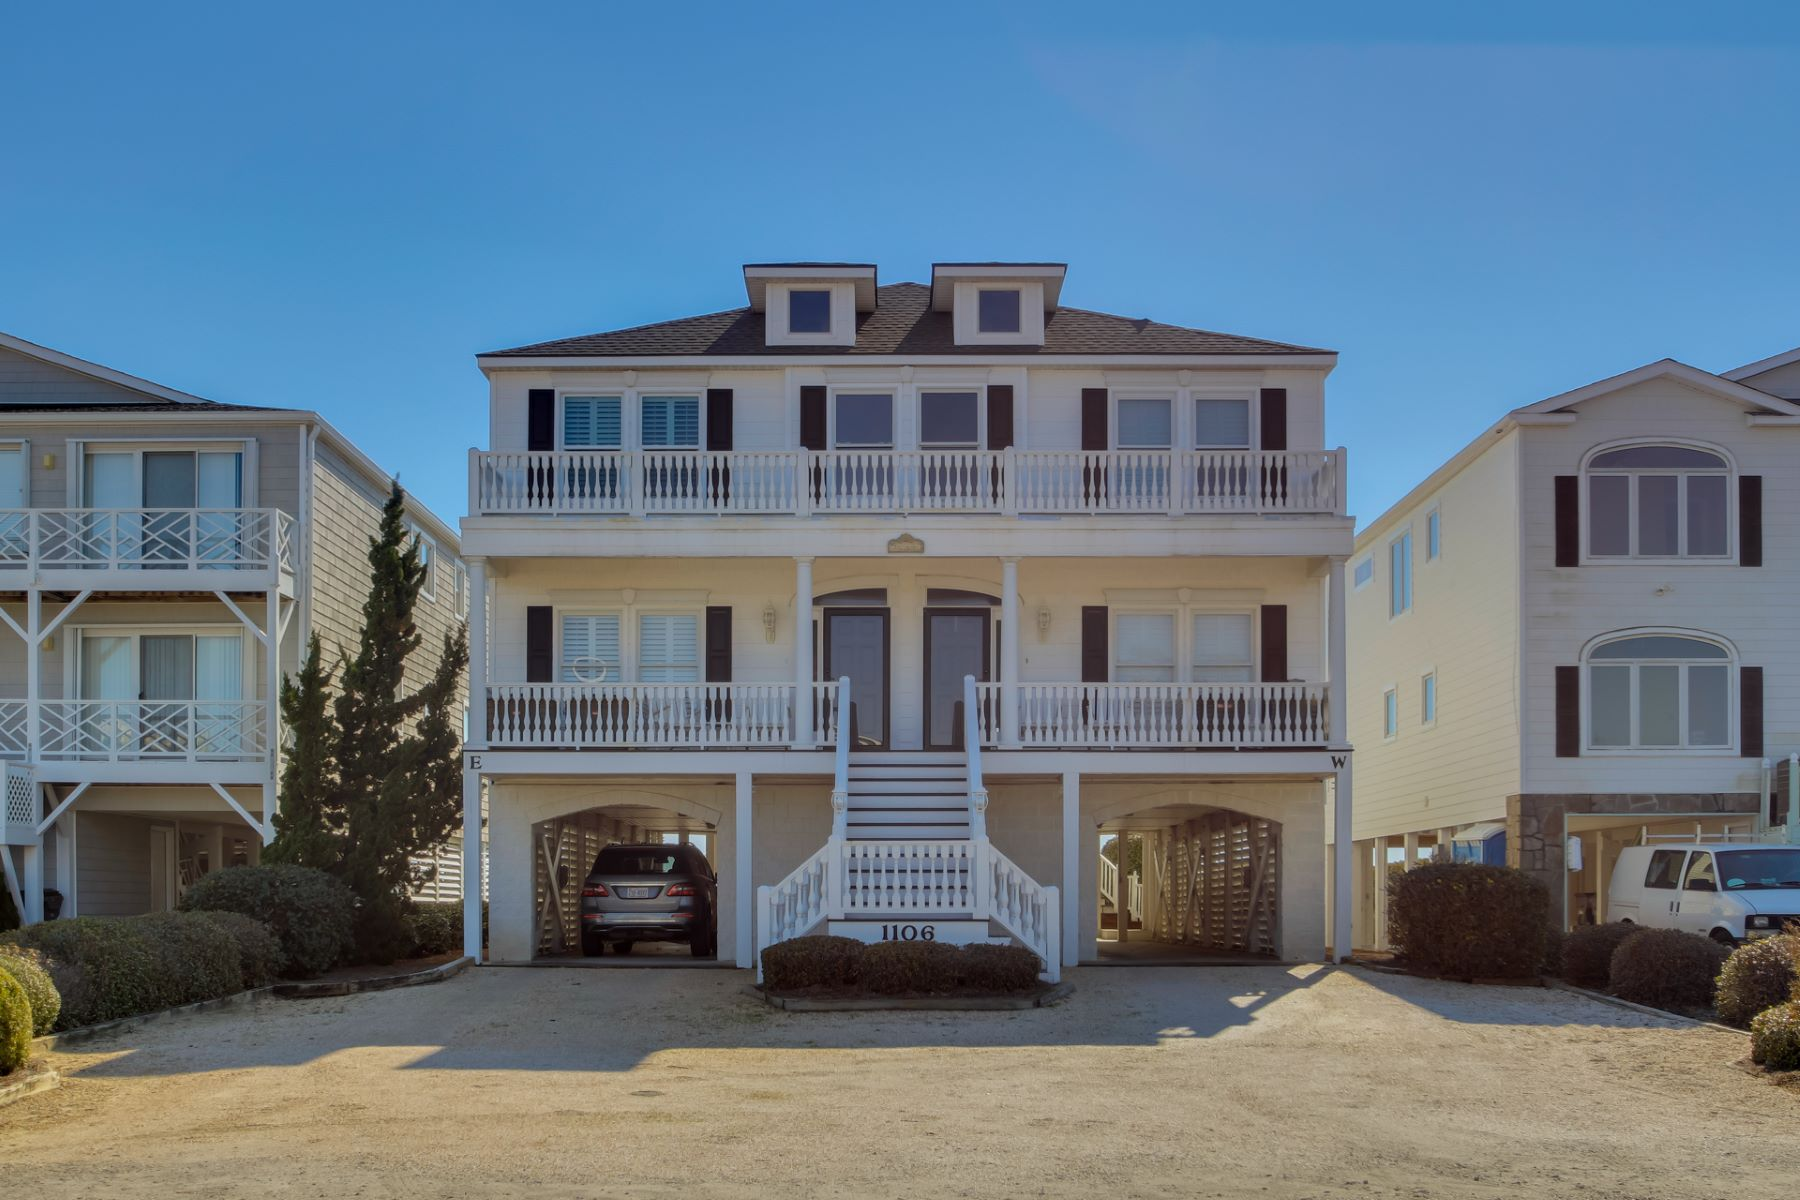 部分所有权 为 销售 在 Have this Elegant Oceanfront 5 Weeks a Year! 1106 E Main Street B Sunset Beach, 北卡罗来纳州, 28468 美国